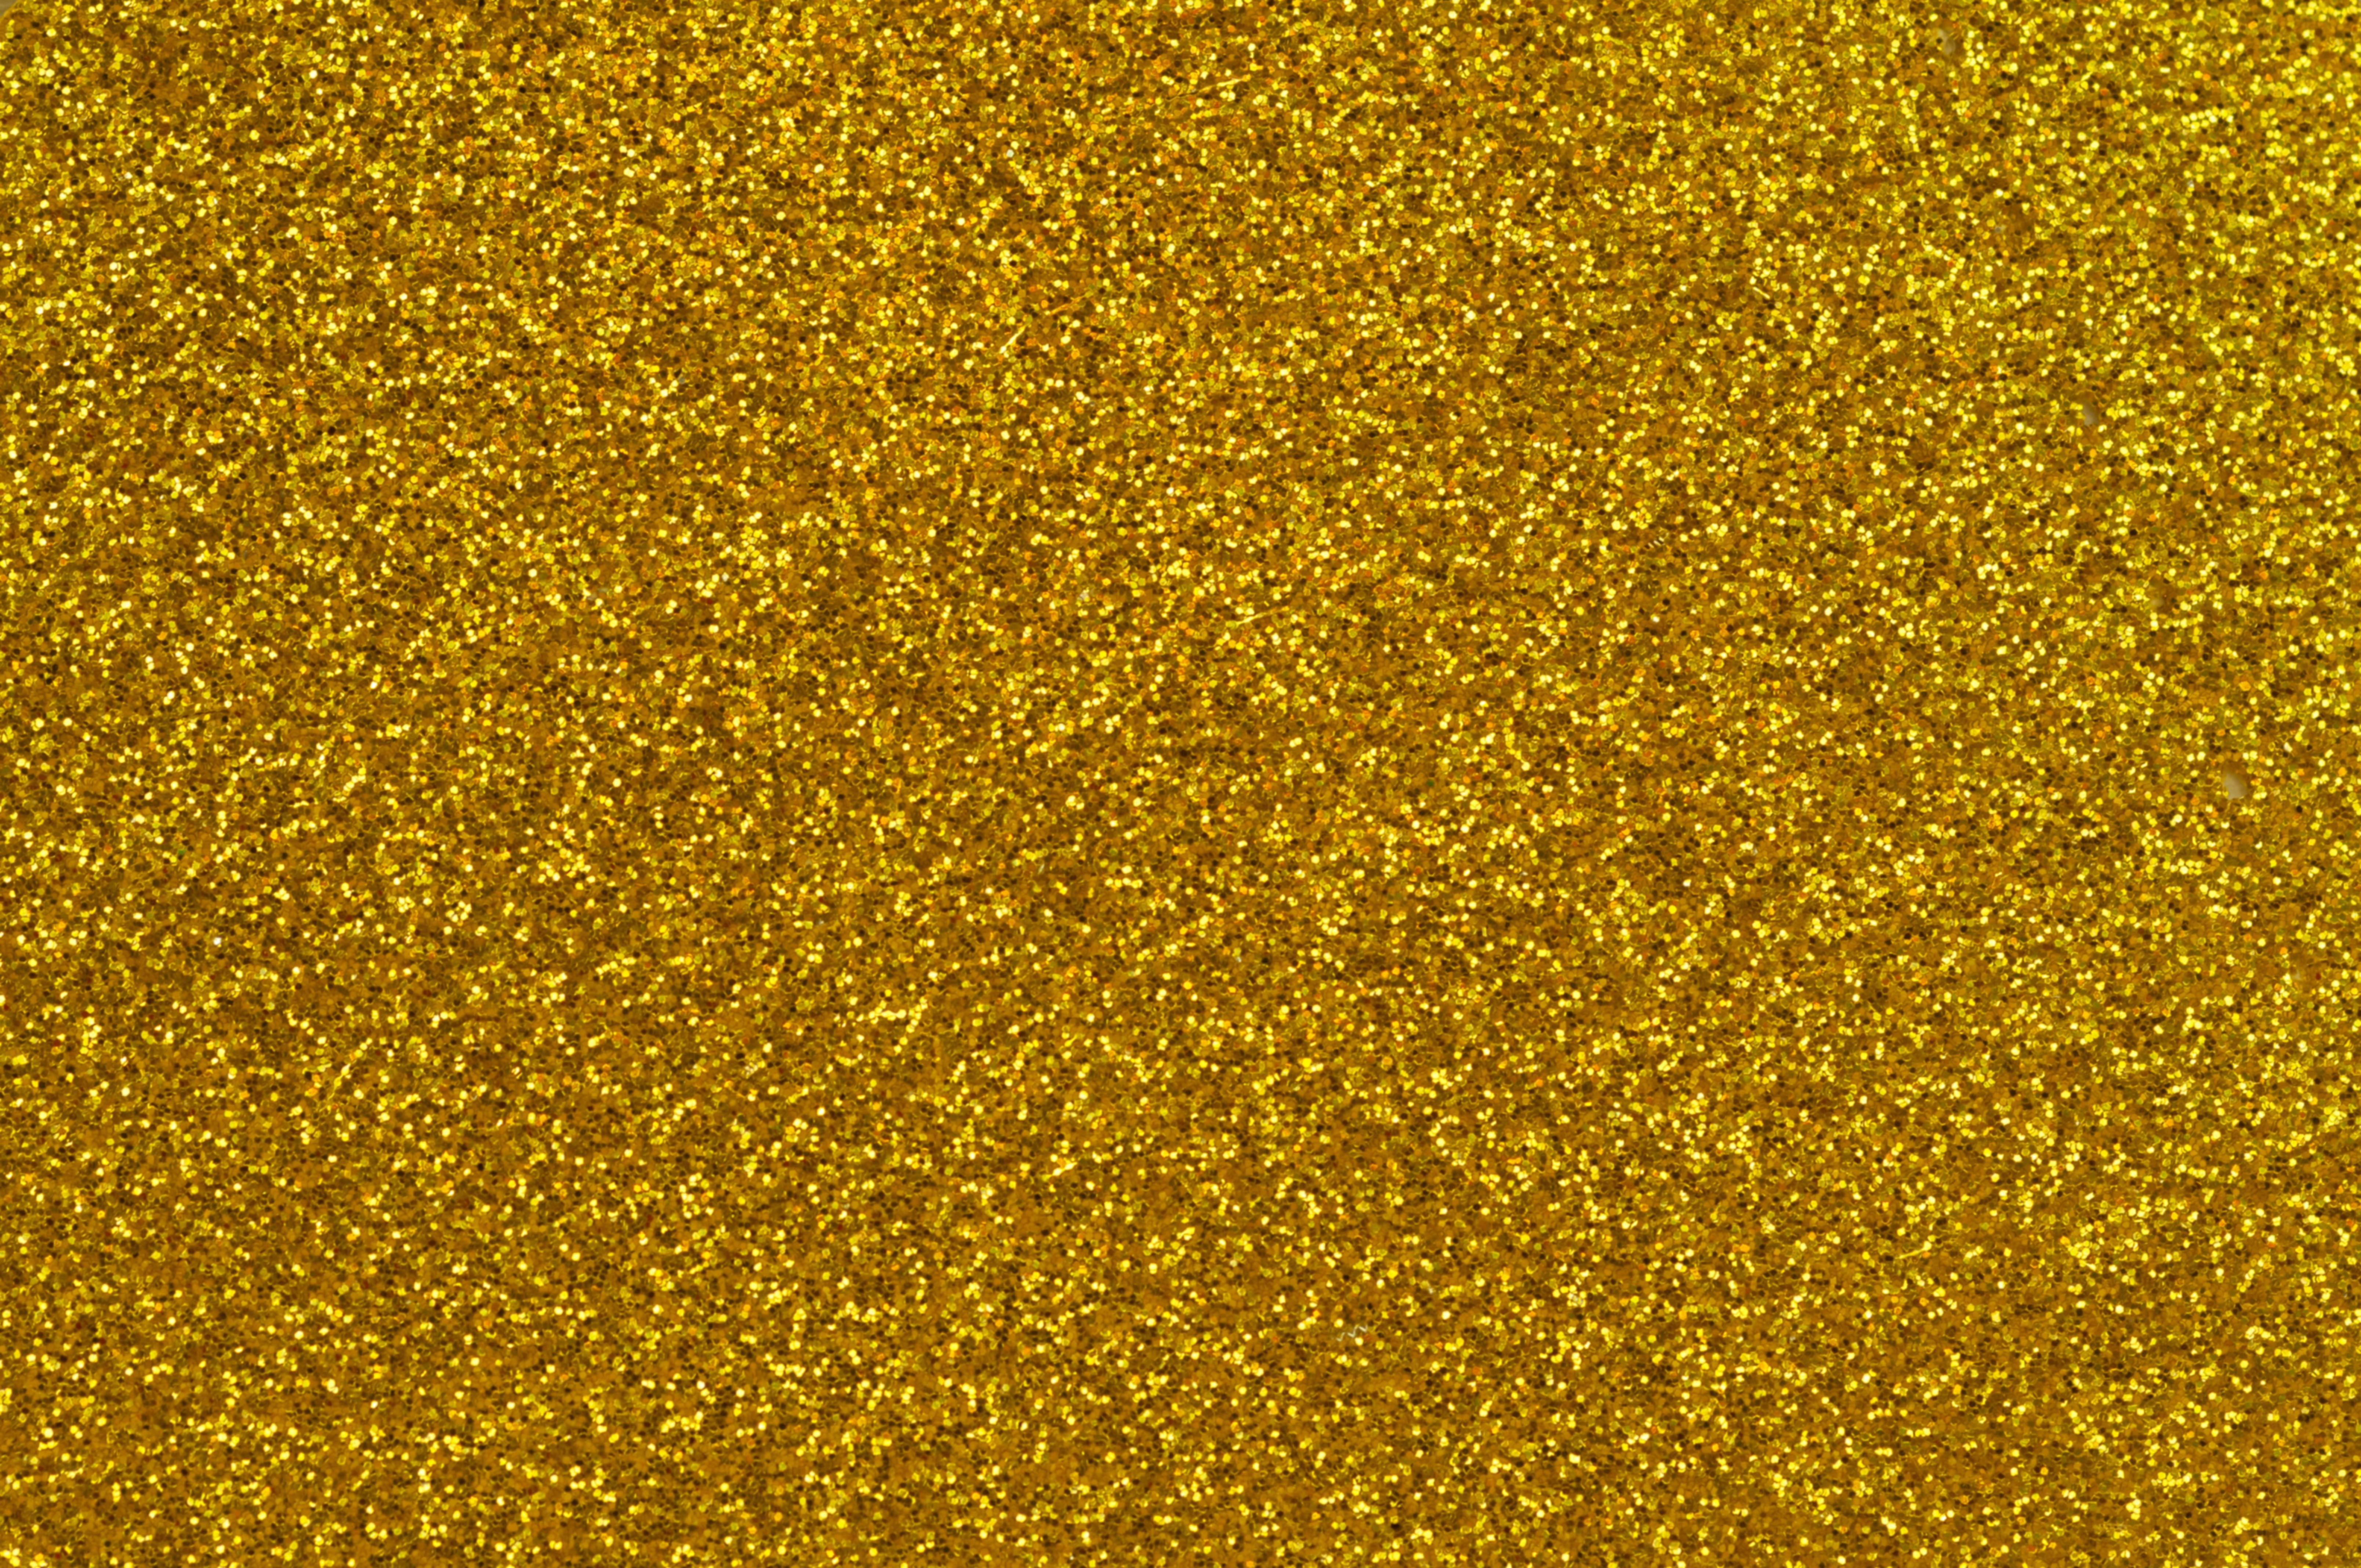 Gold glitter background photo